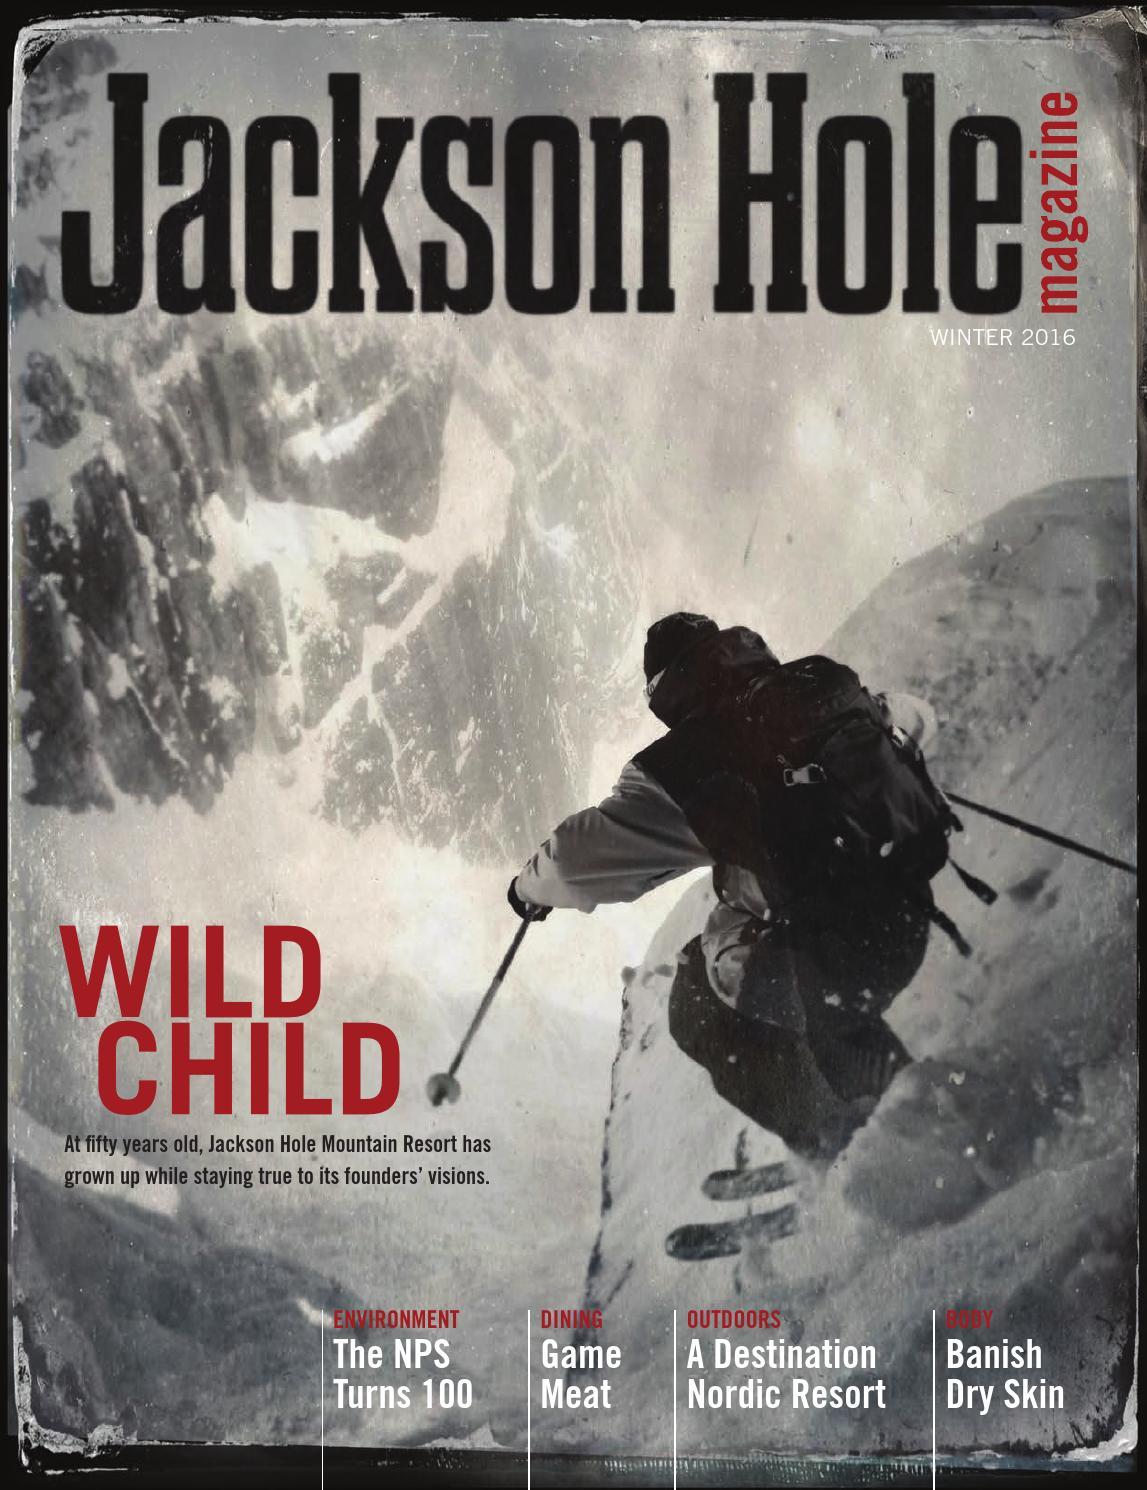 e28d5a3eed Jackson Hole magazine Winter 2016 by Teton Media Works